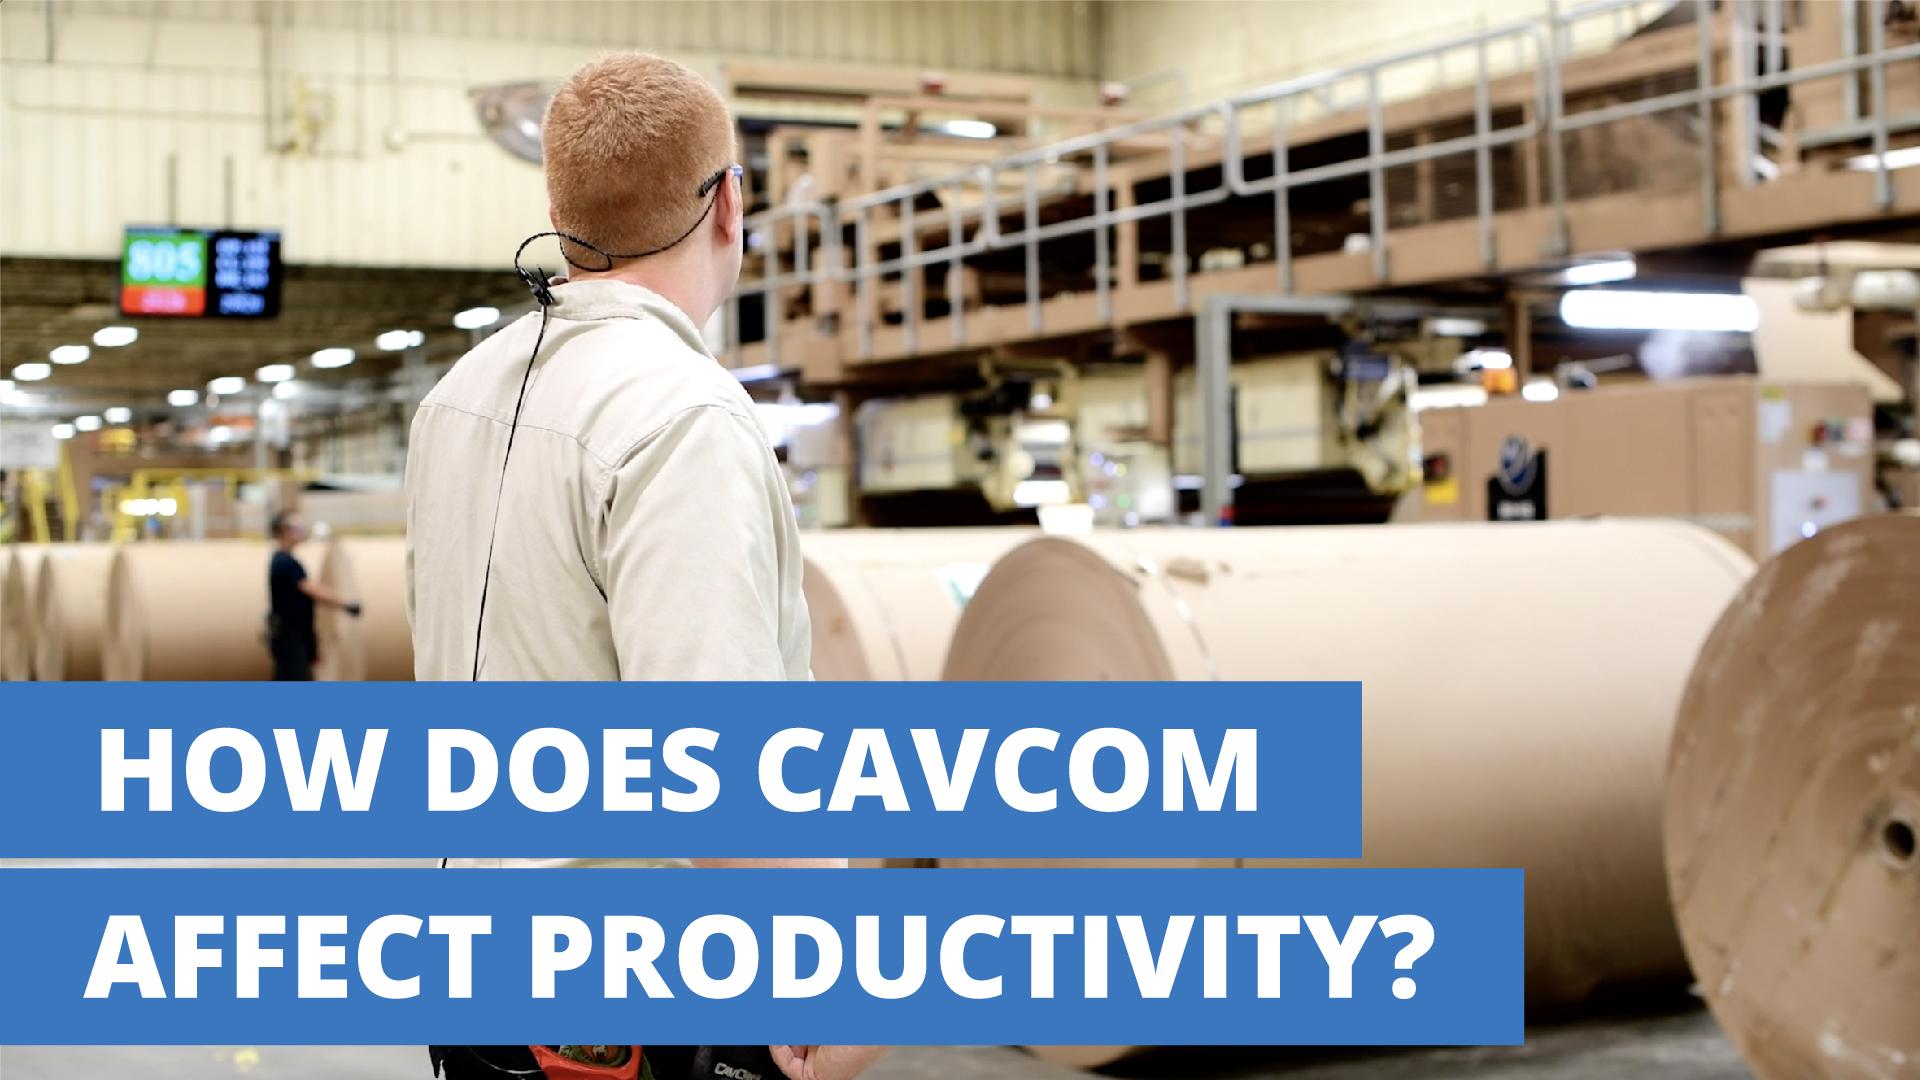 CavCom-Impact-On-Plant-Video-10-07-19